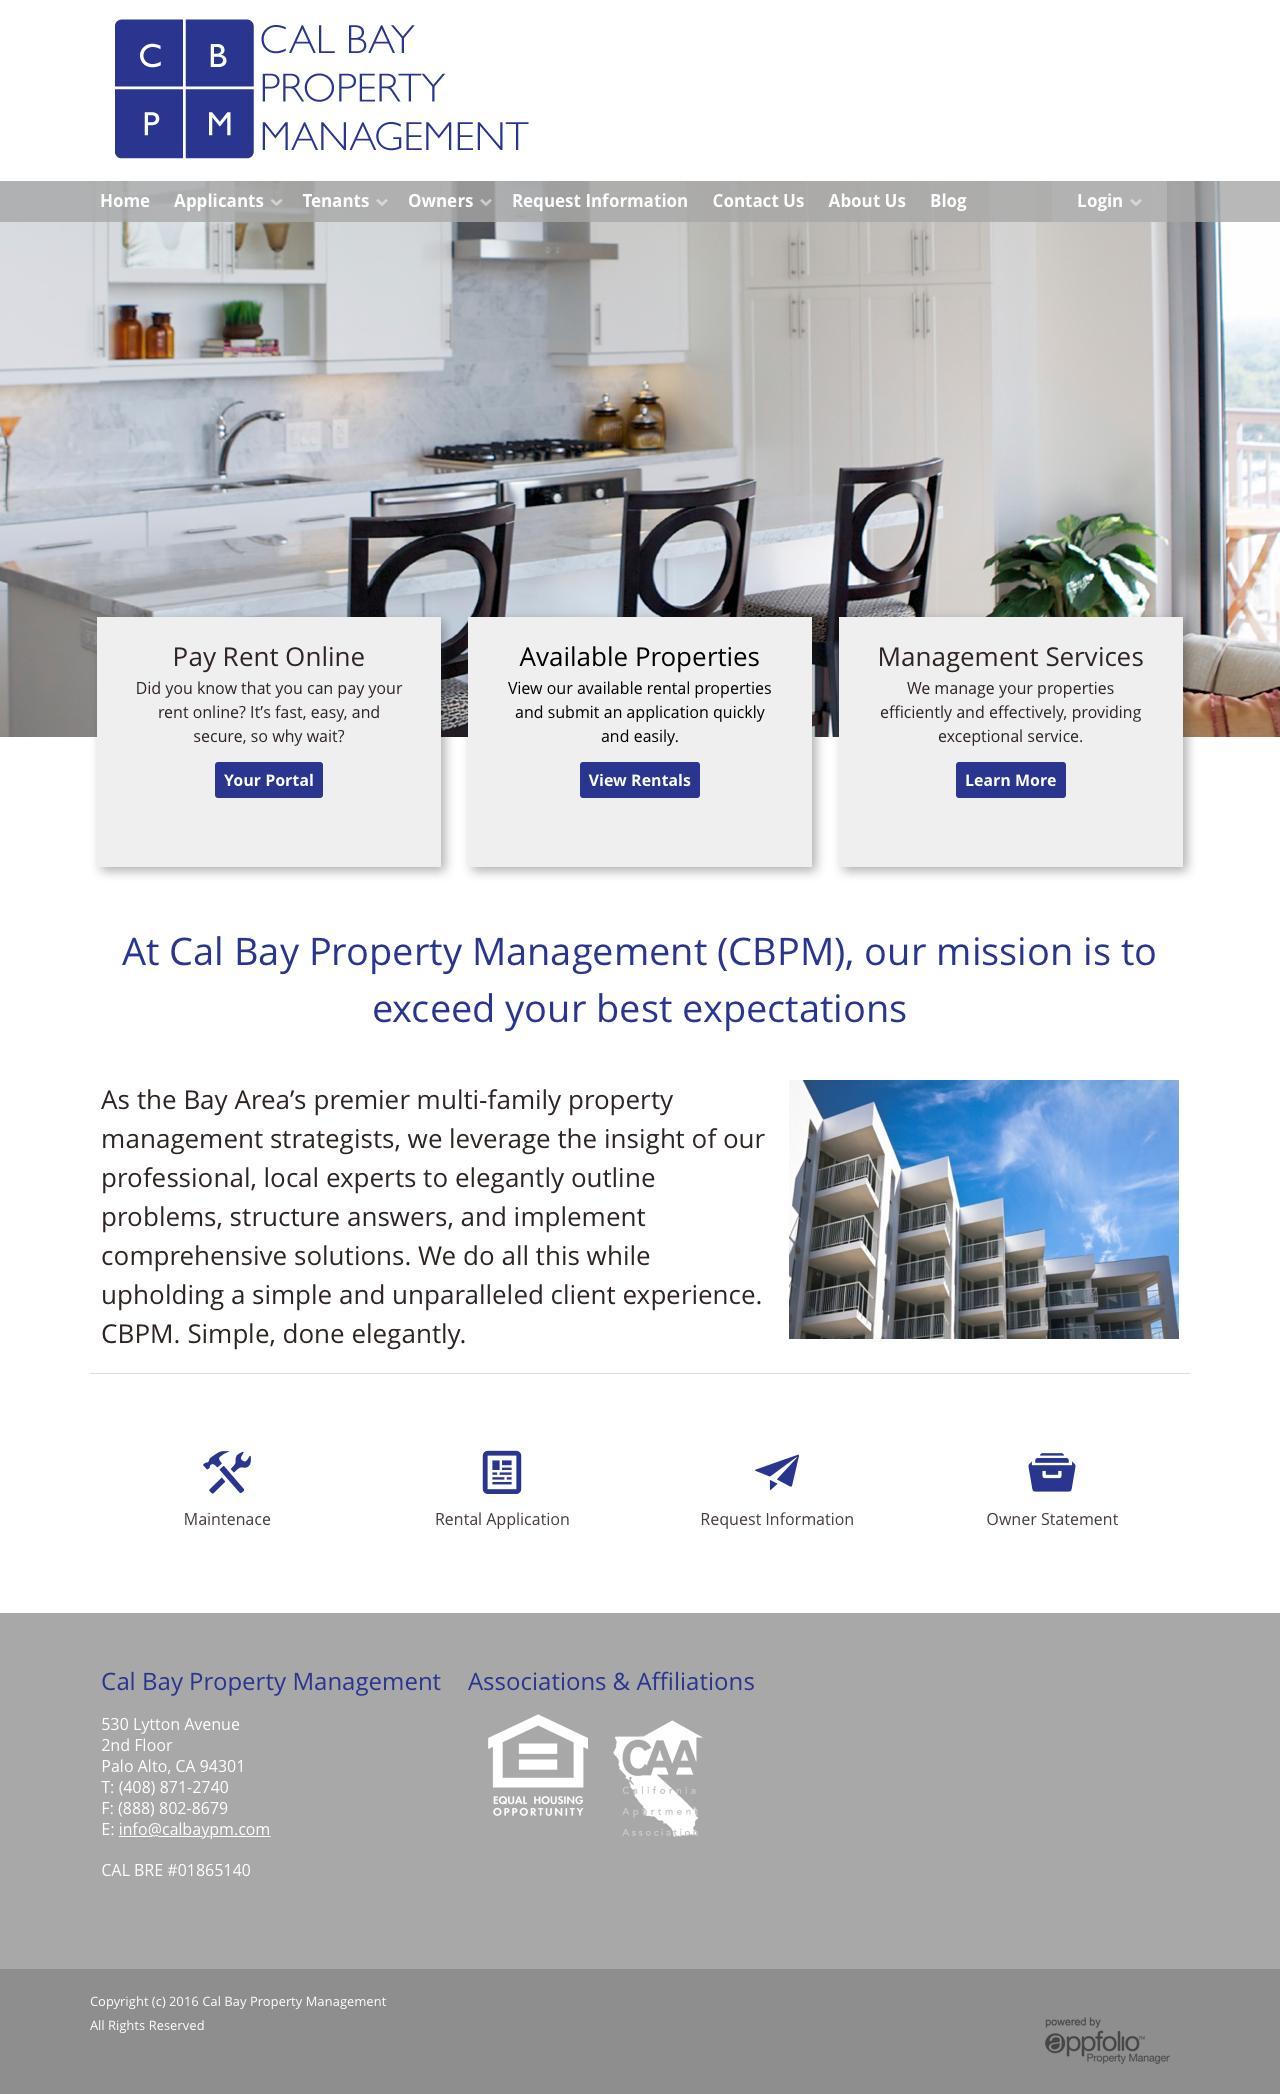 Web Design Example | A page on calbaypm com | Crayon